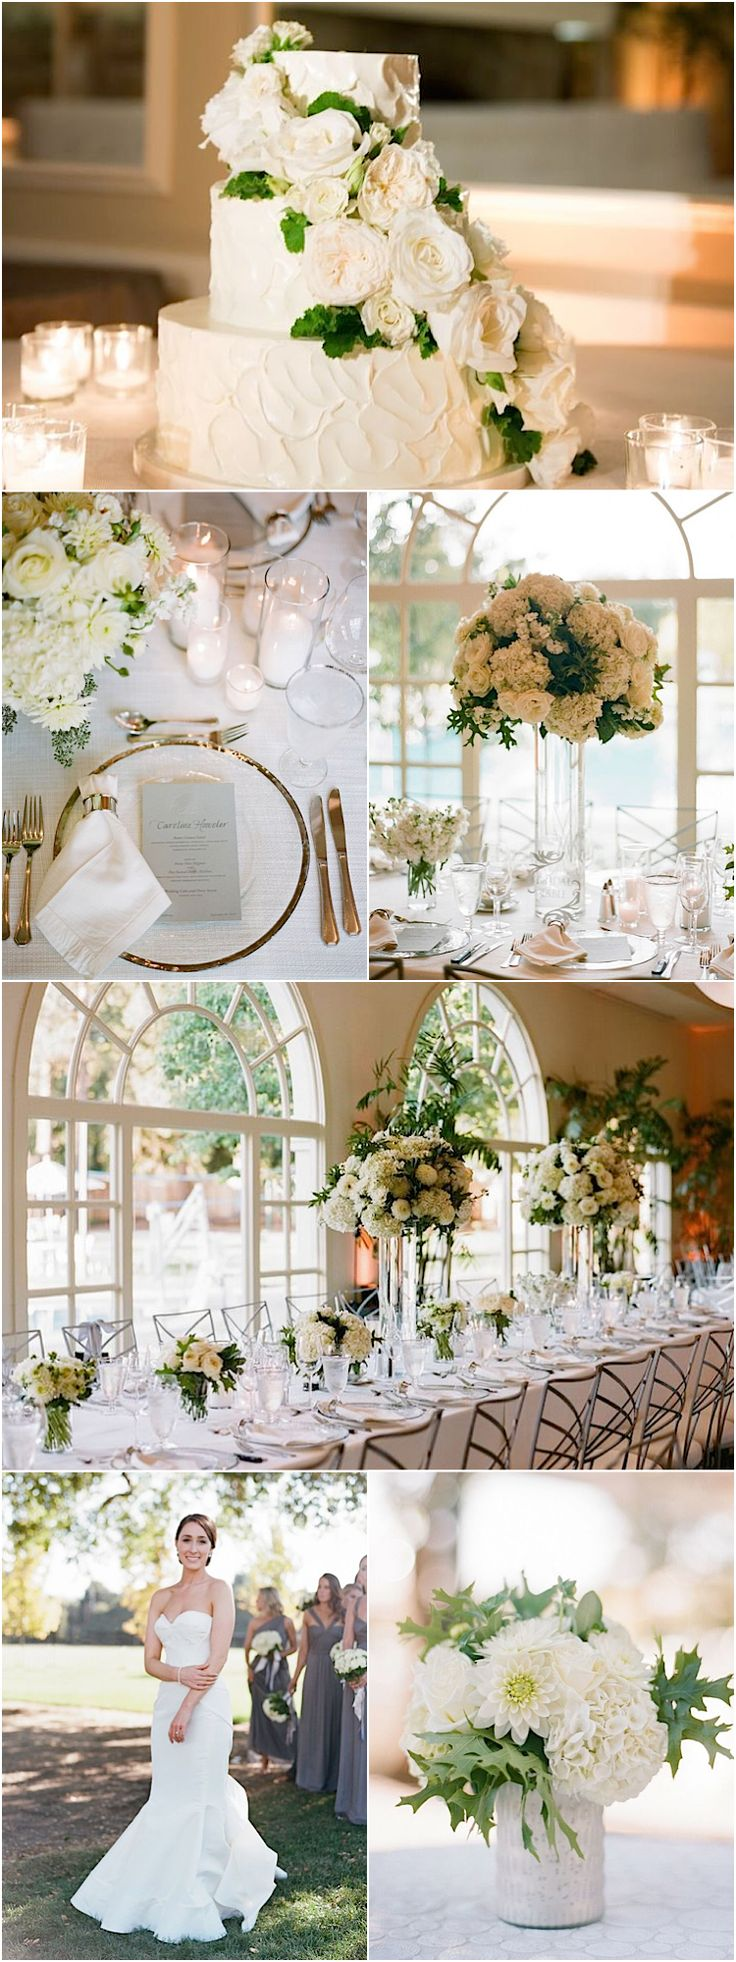 Wedding decoration ideas kerala   best Wedding decoration images on Pinterest  Weddings Indian